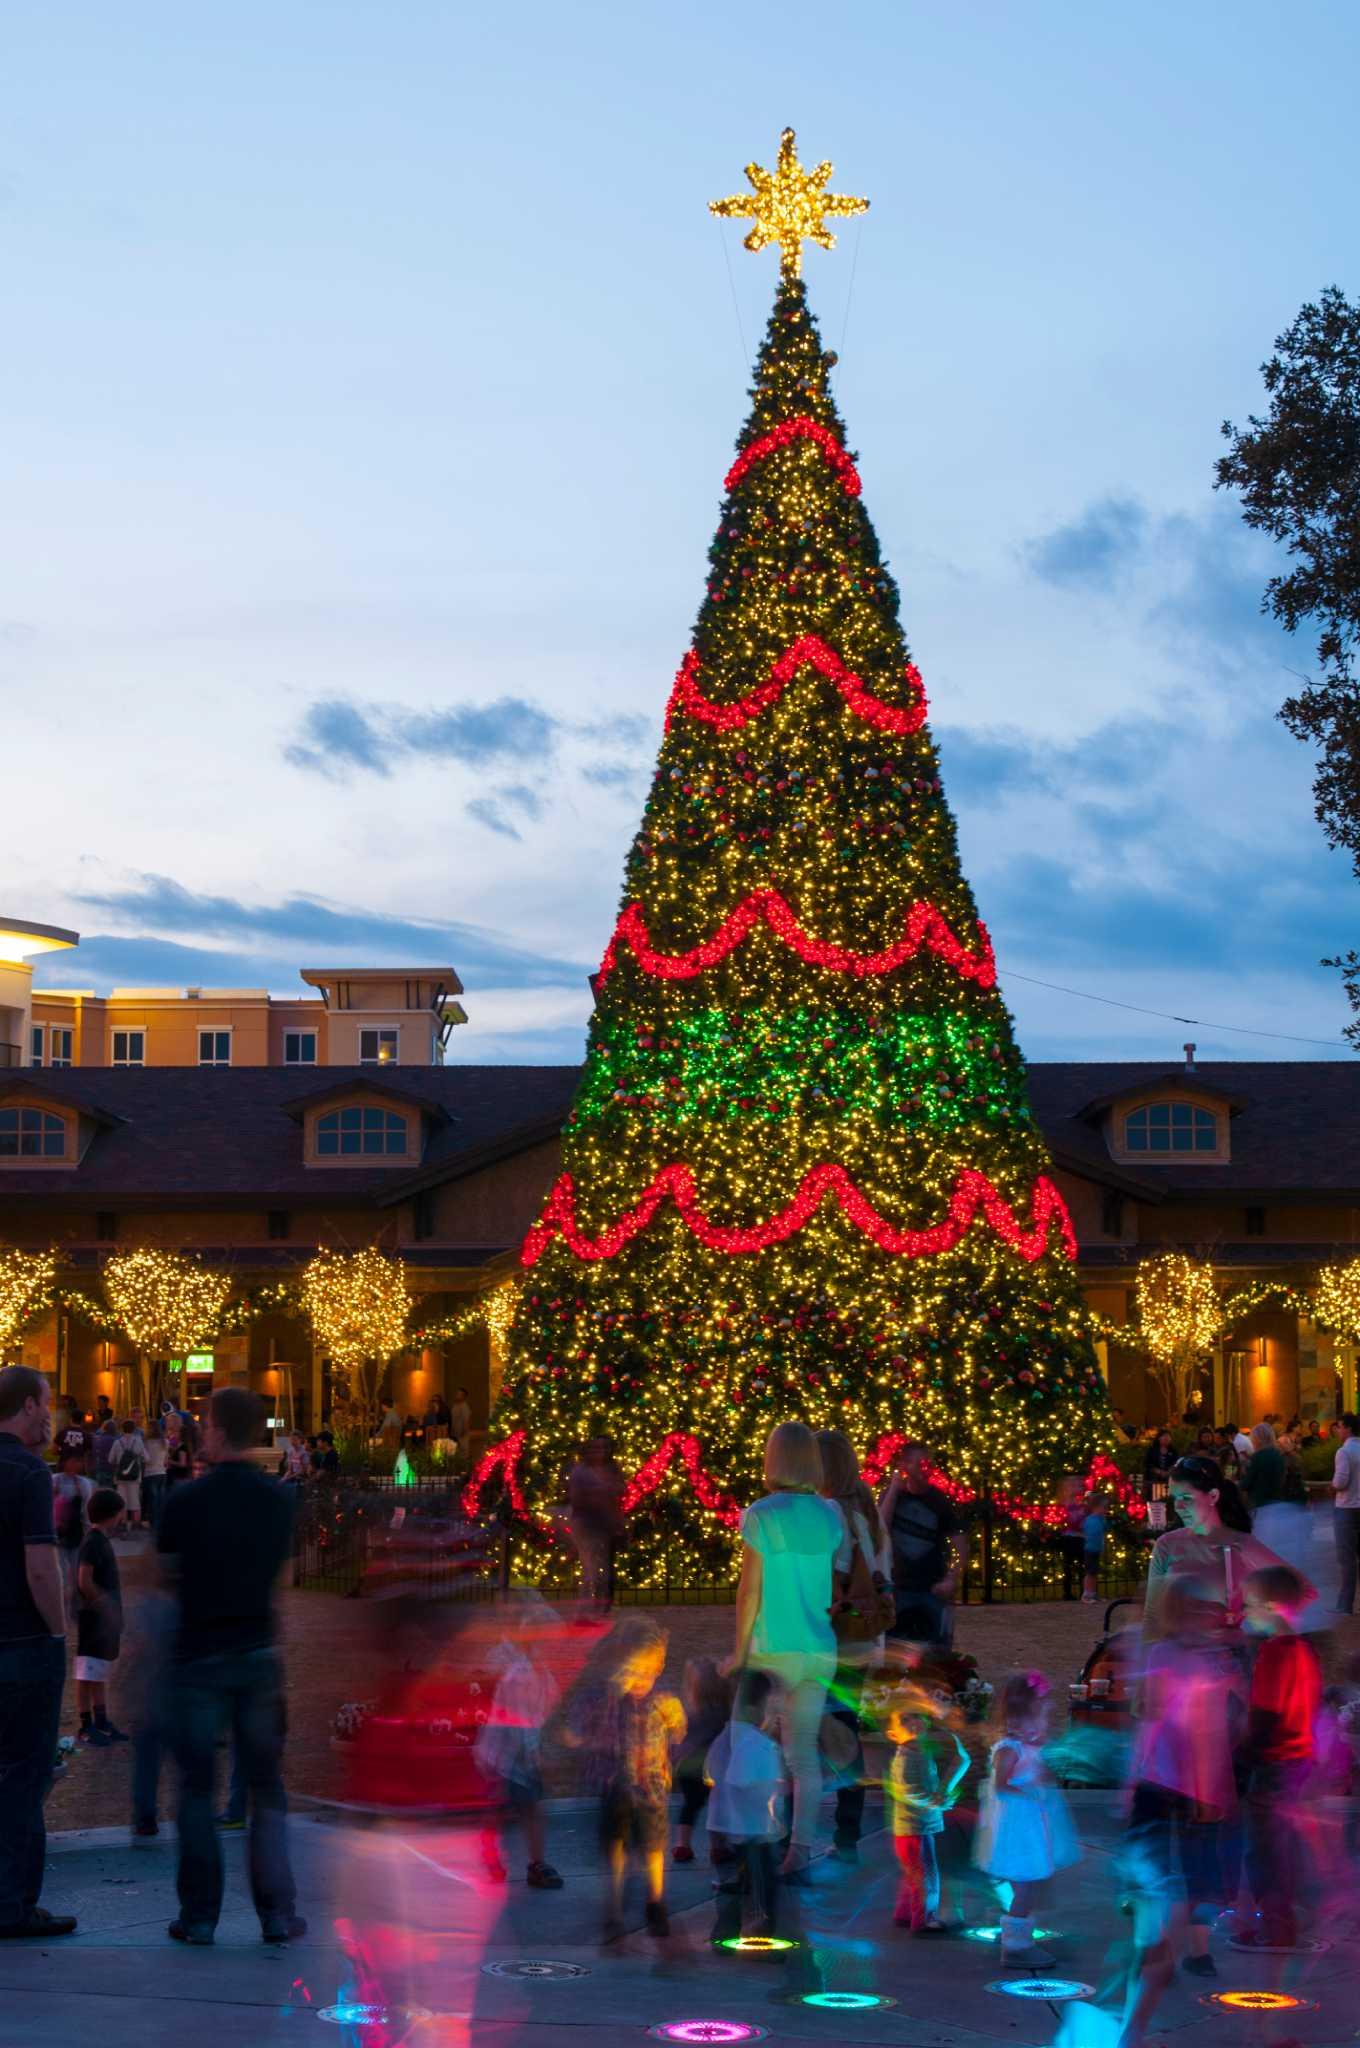 Christmas tree lighting set for Nov. 21 - Houston Chronicle